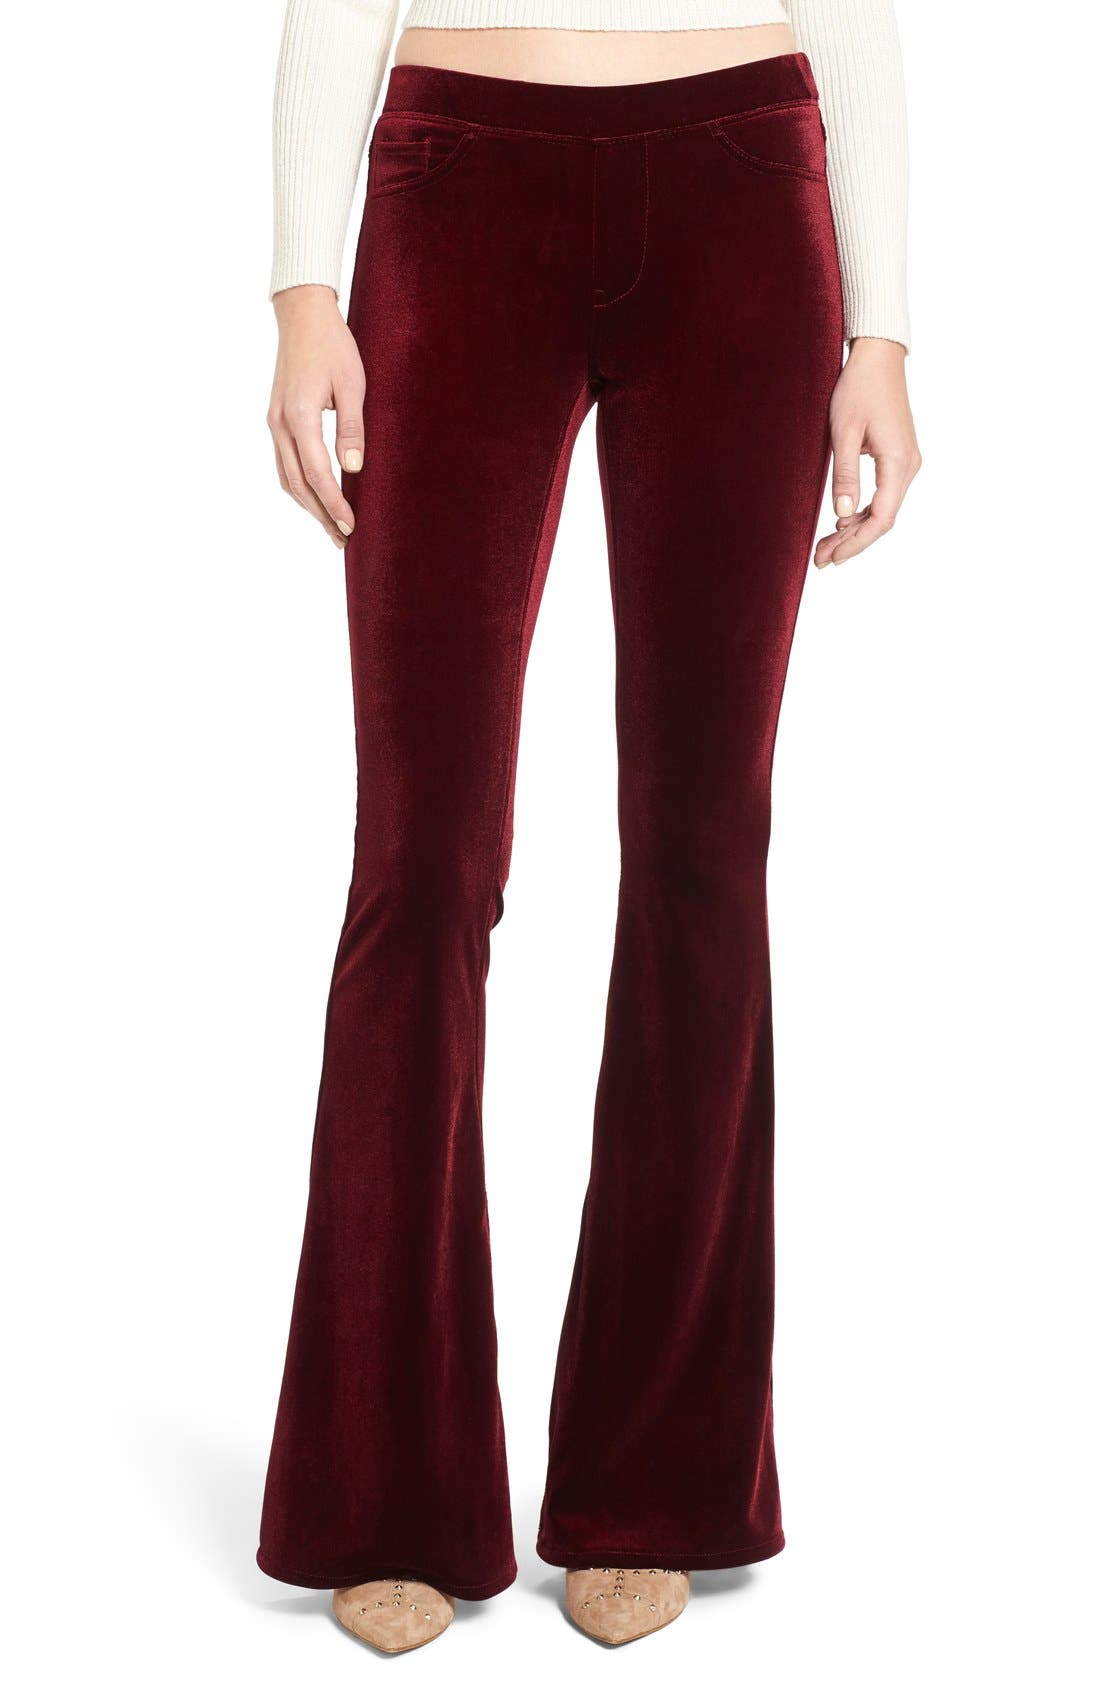 Alternate Image 1 Selected - BLANKNYC Velvet Flare Pants